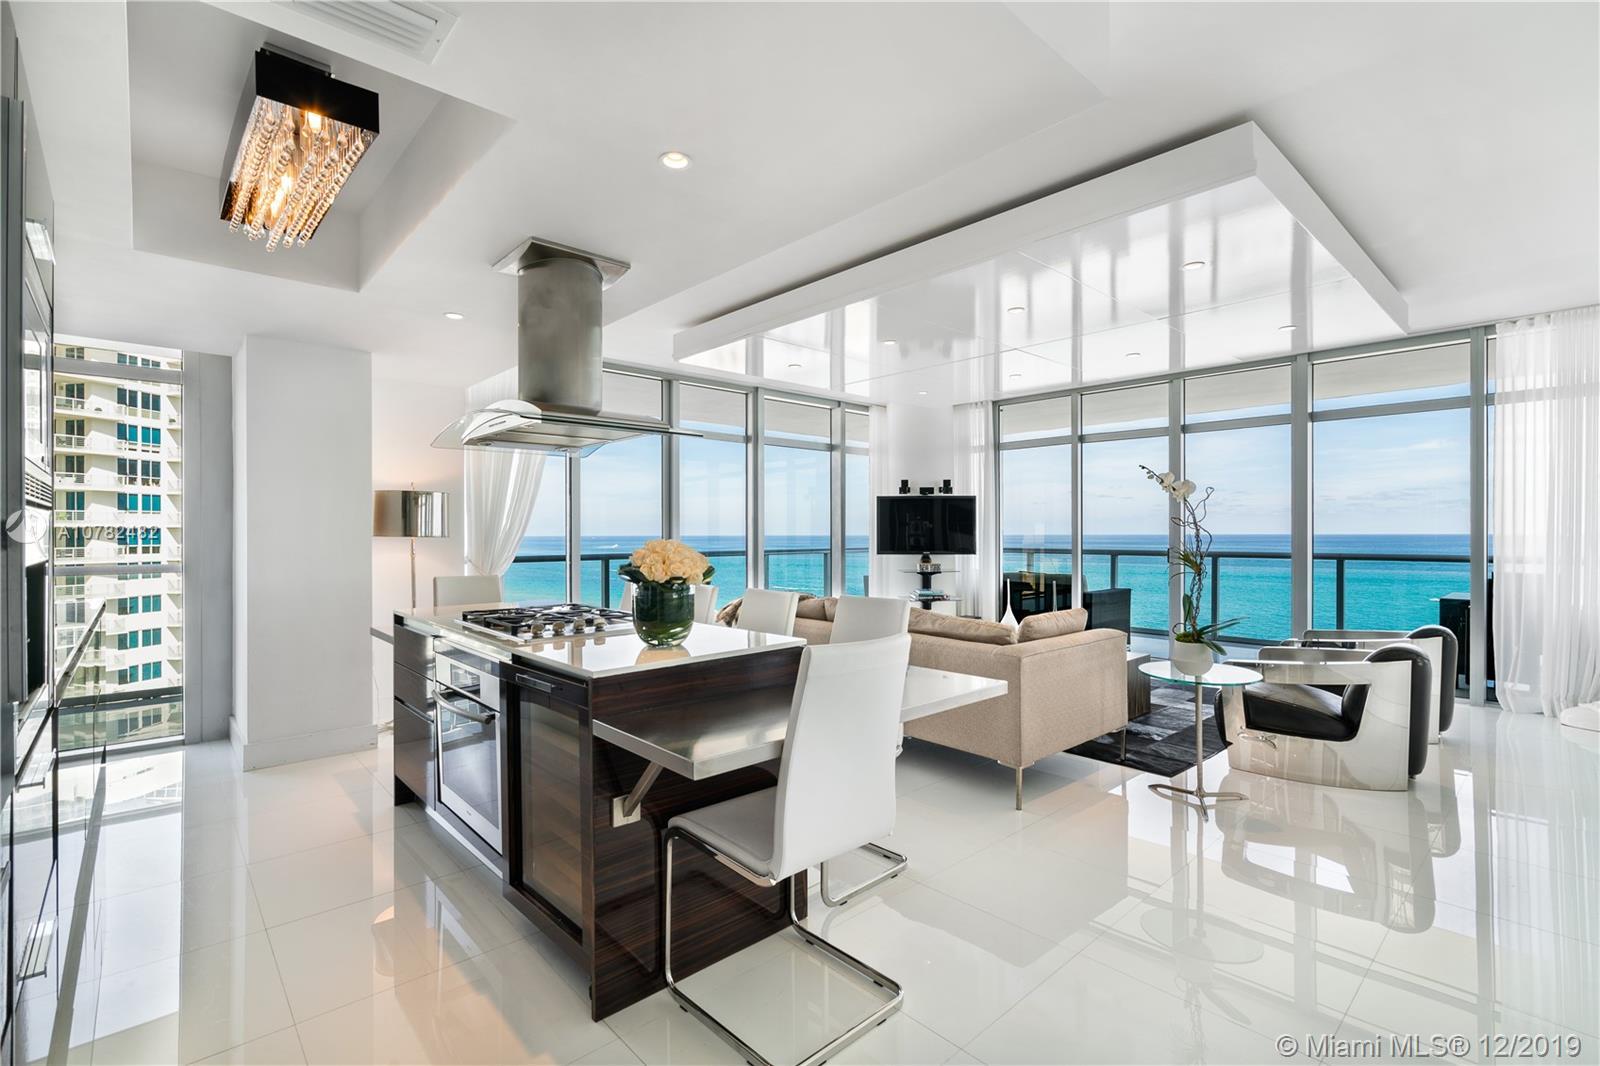 3737 Collins Ave, S-1401 - Miami Beach, Florida